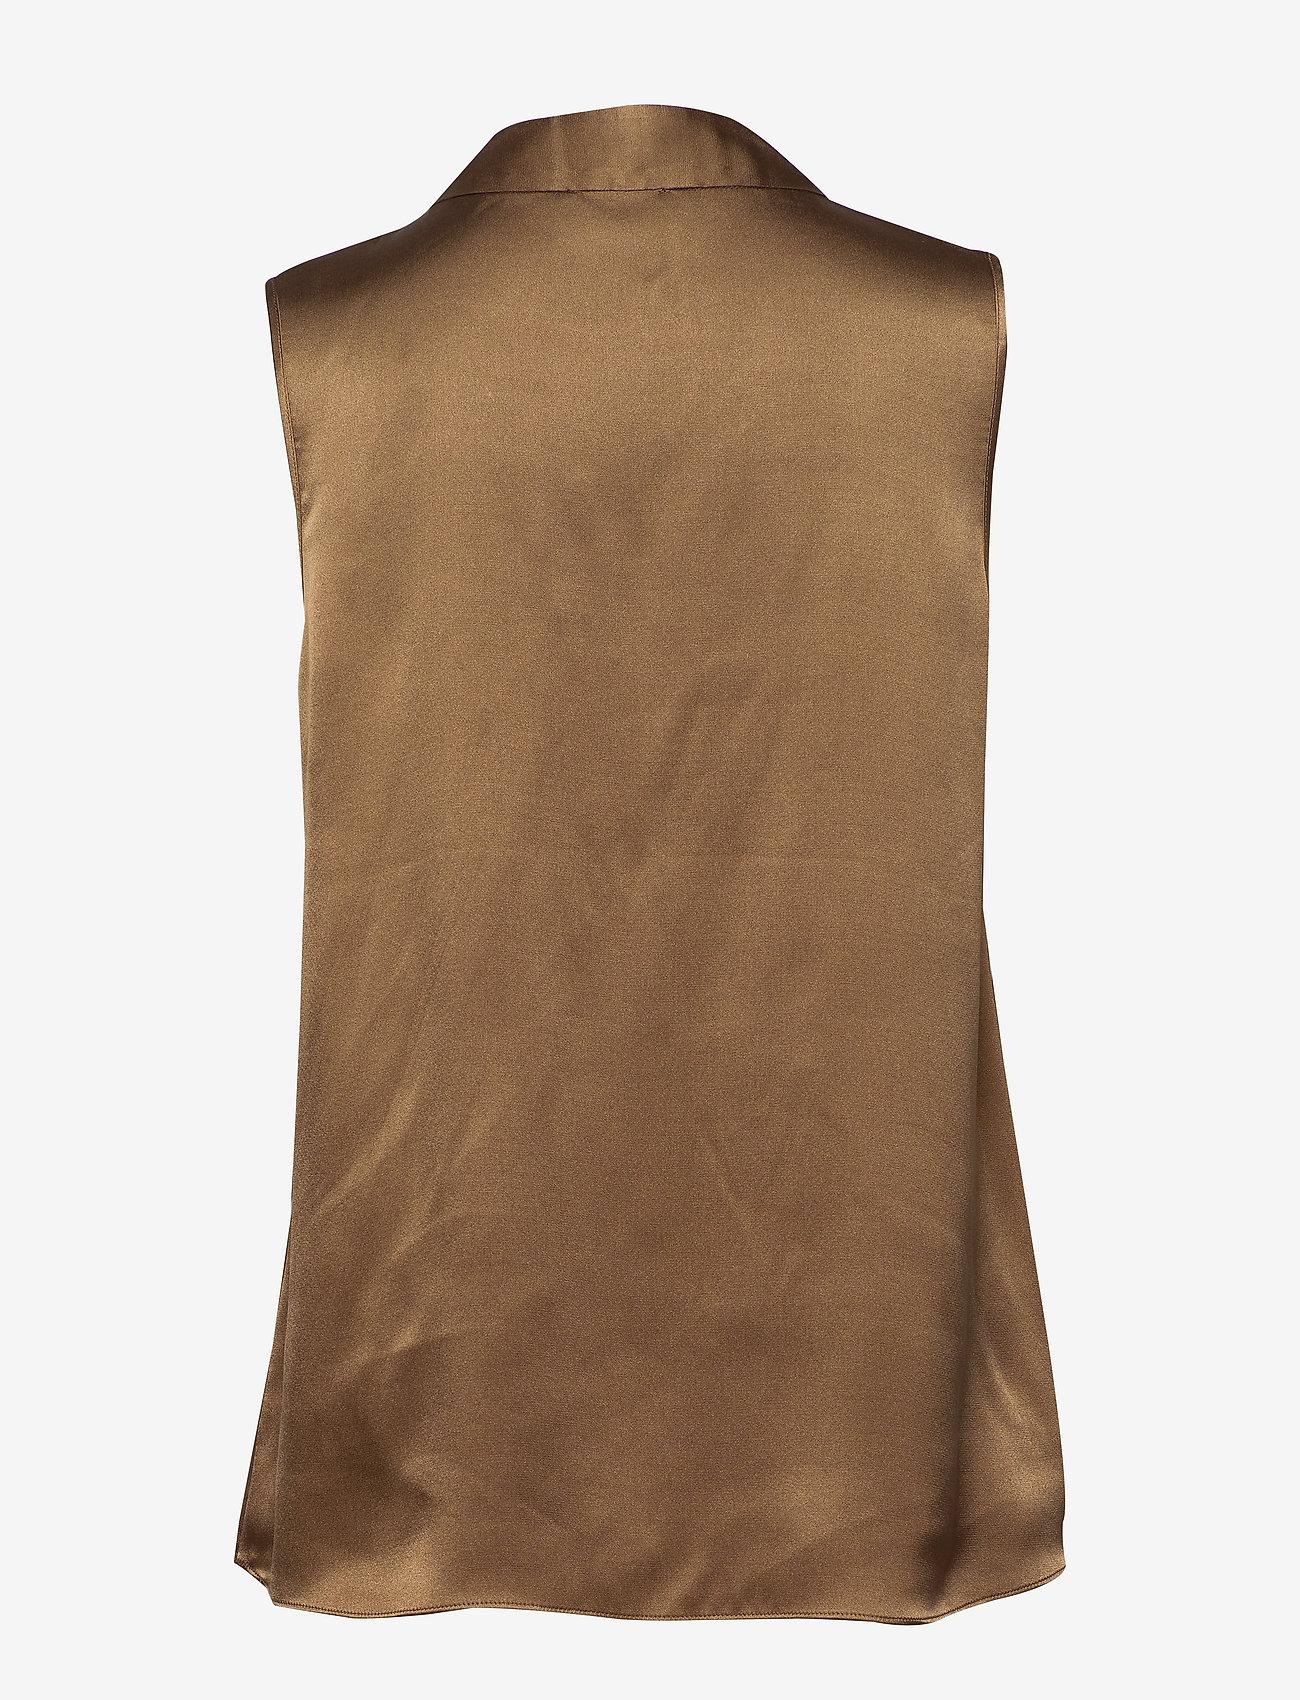 SAND - Double Silk - Prosi Top - blouses zonder mouwen - light camel - 1